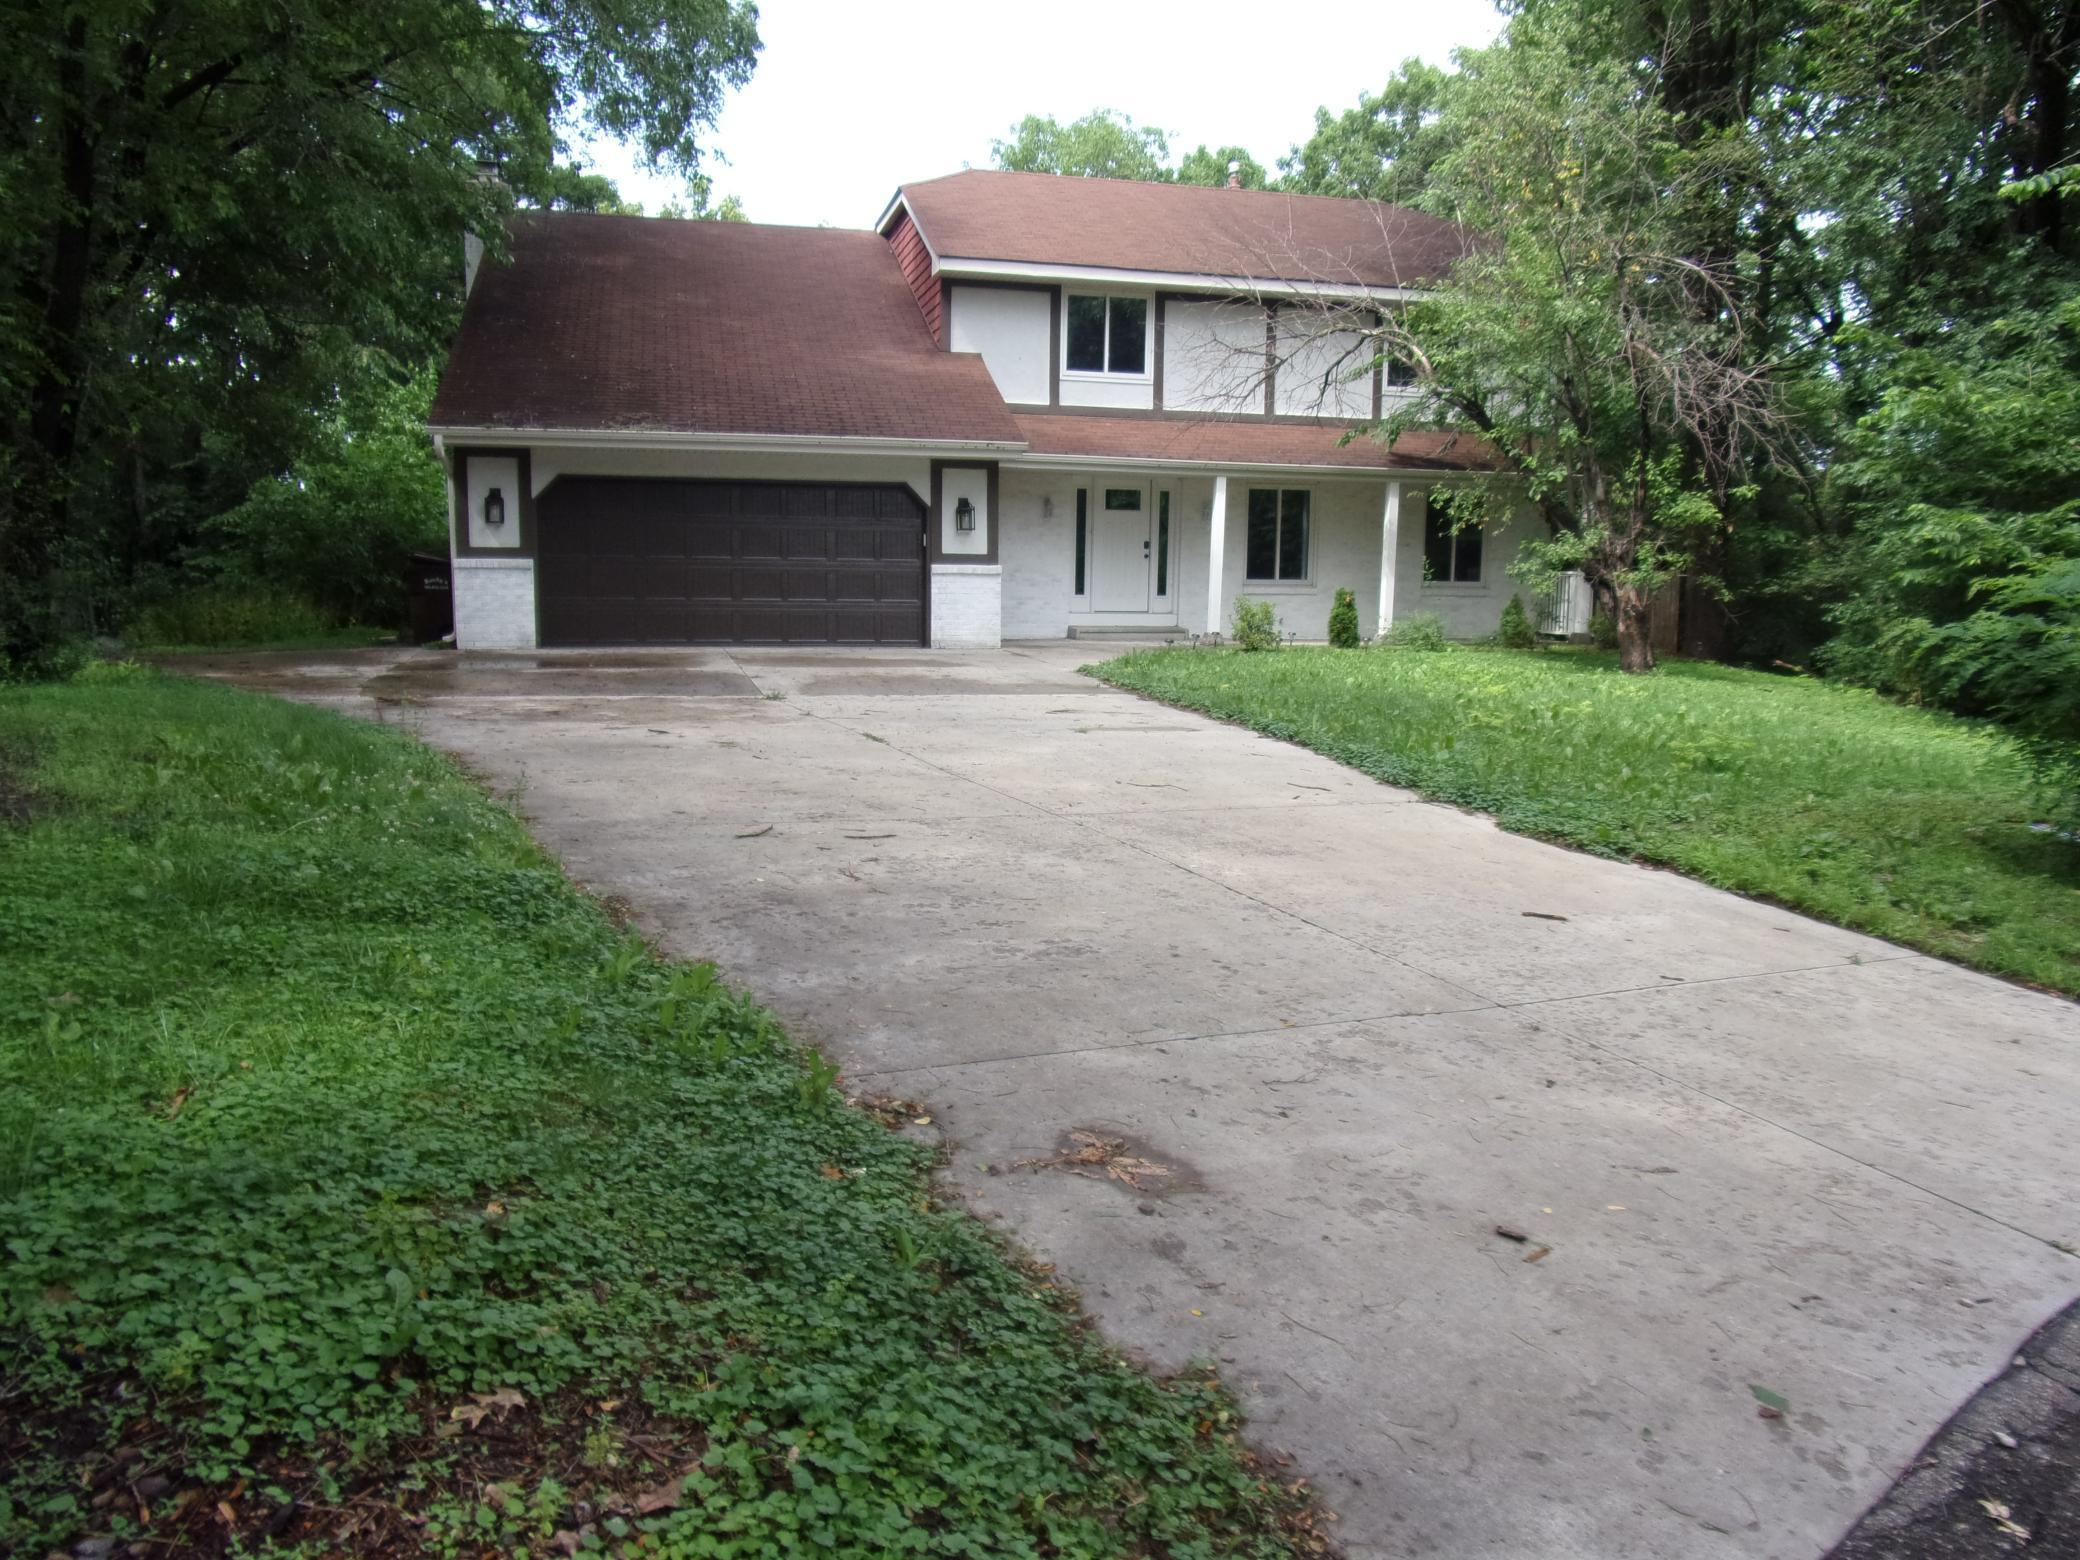 3619 Regal Oak Property Photo - Minnetonka, MN real estate listing